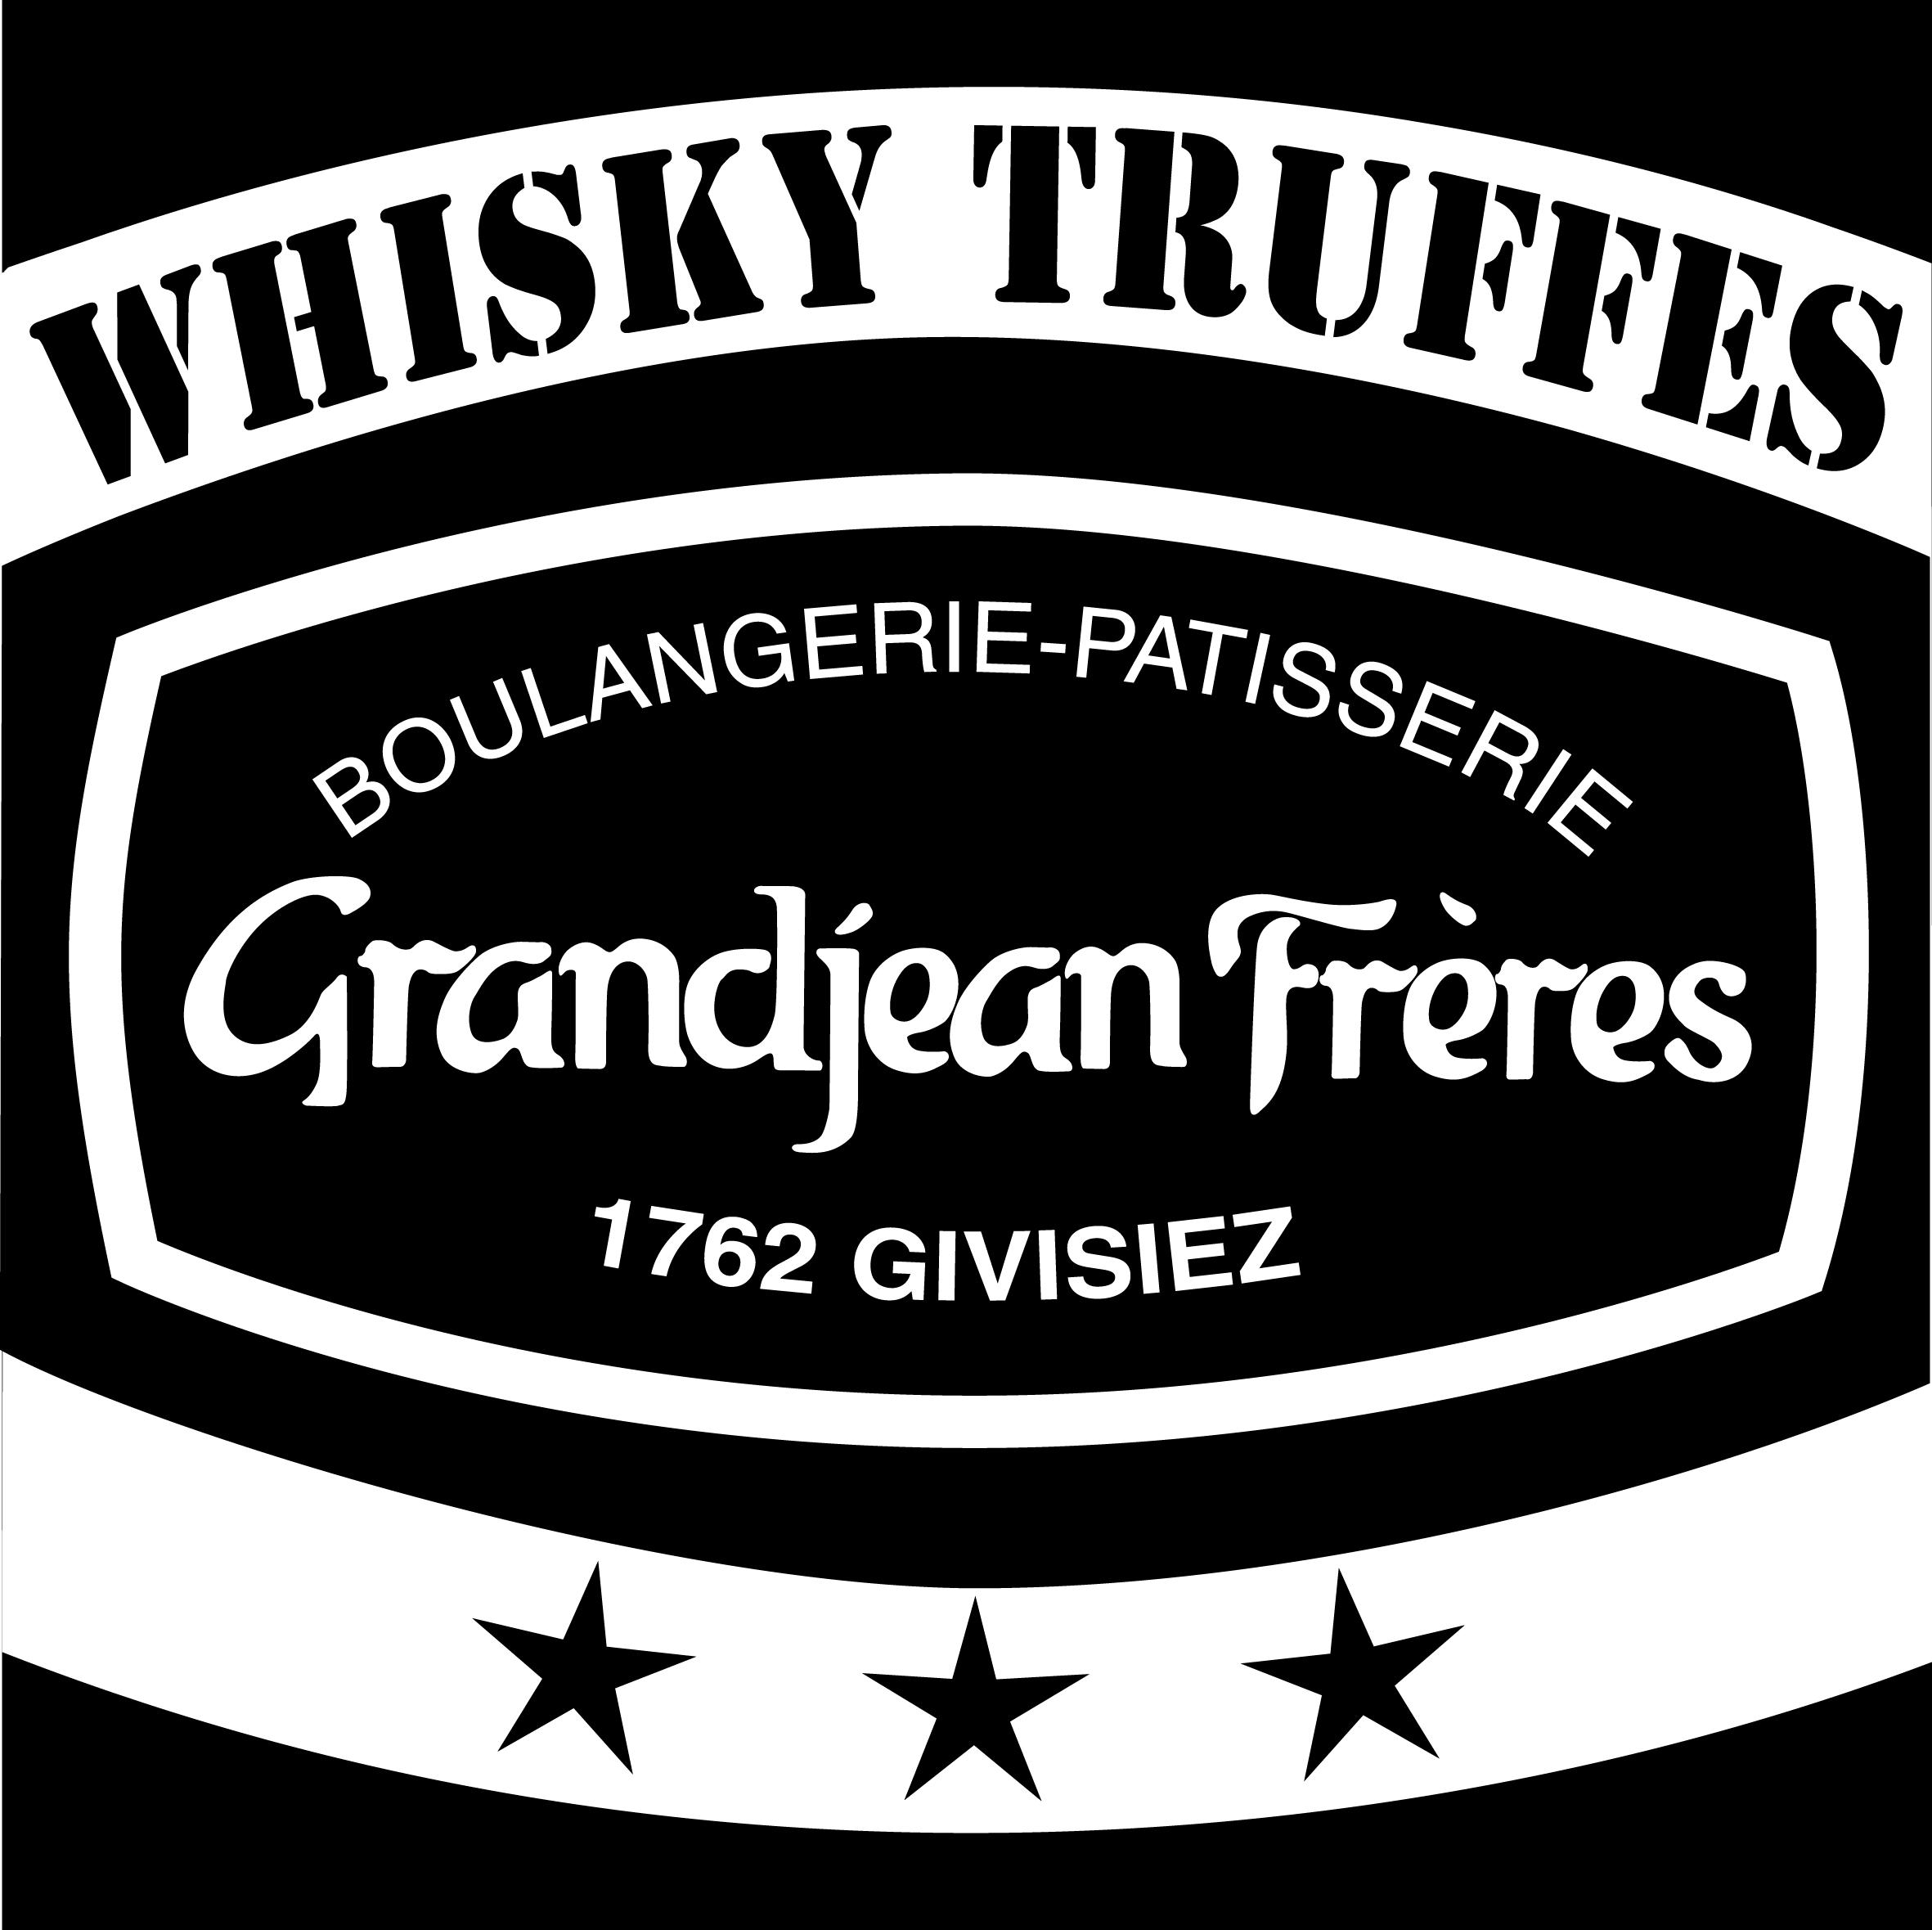 Boulangerie Grandjean Frères | Whisky Truffes